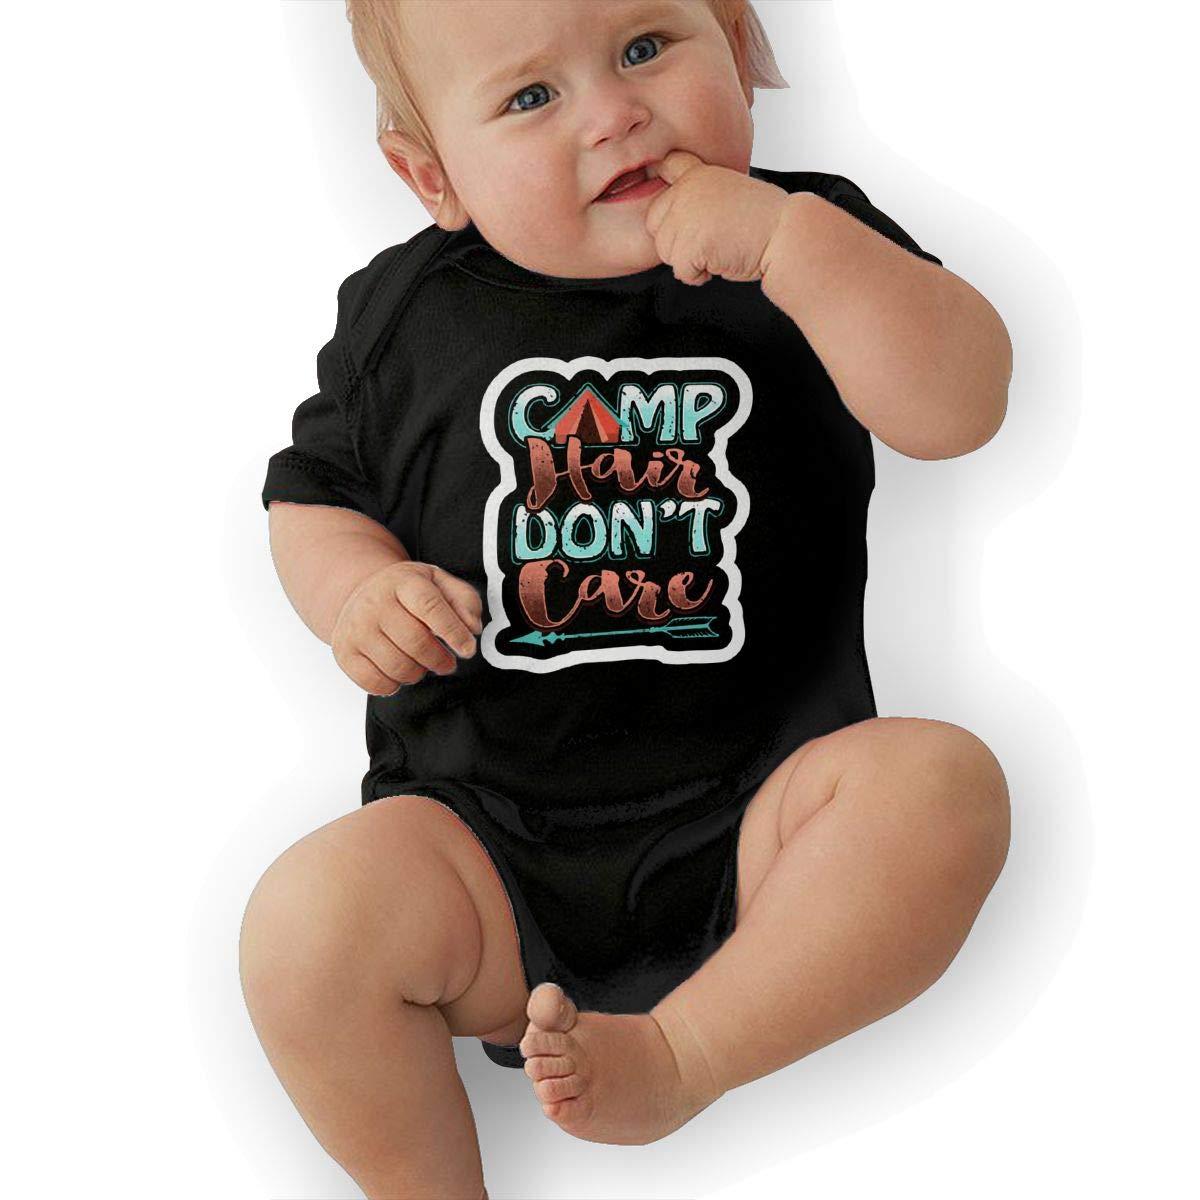 TAOHJS97 Newborn Camp Hair Dont Care Short Sleeve Climbing Clothes Bodysuits Suit 6-24 Months